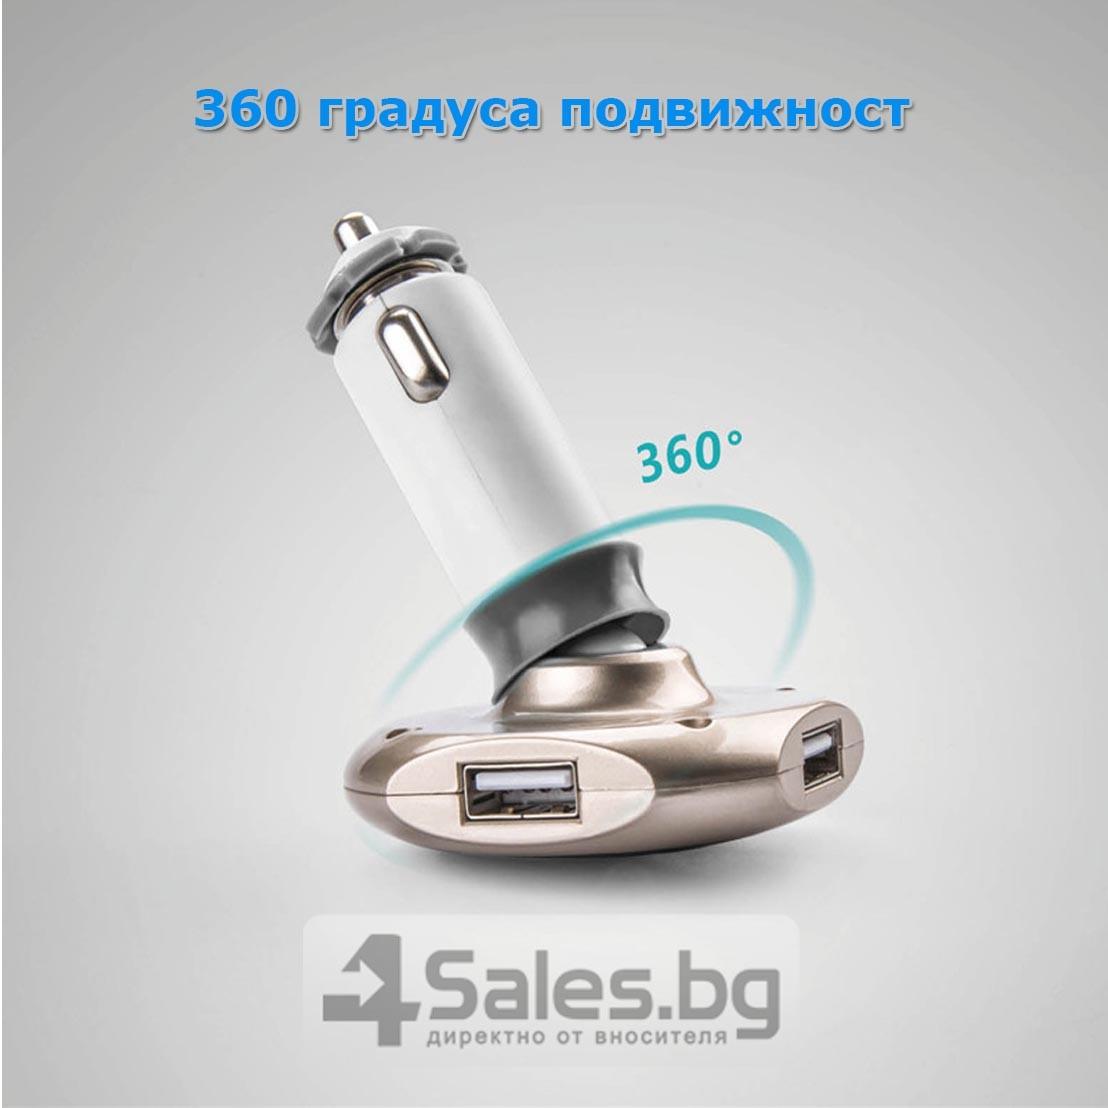 Wireless FM трансмитер CAR Q7 с Bluetooth, 2 USB, дигитален дисплей, MP3 HF5 9